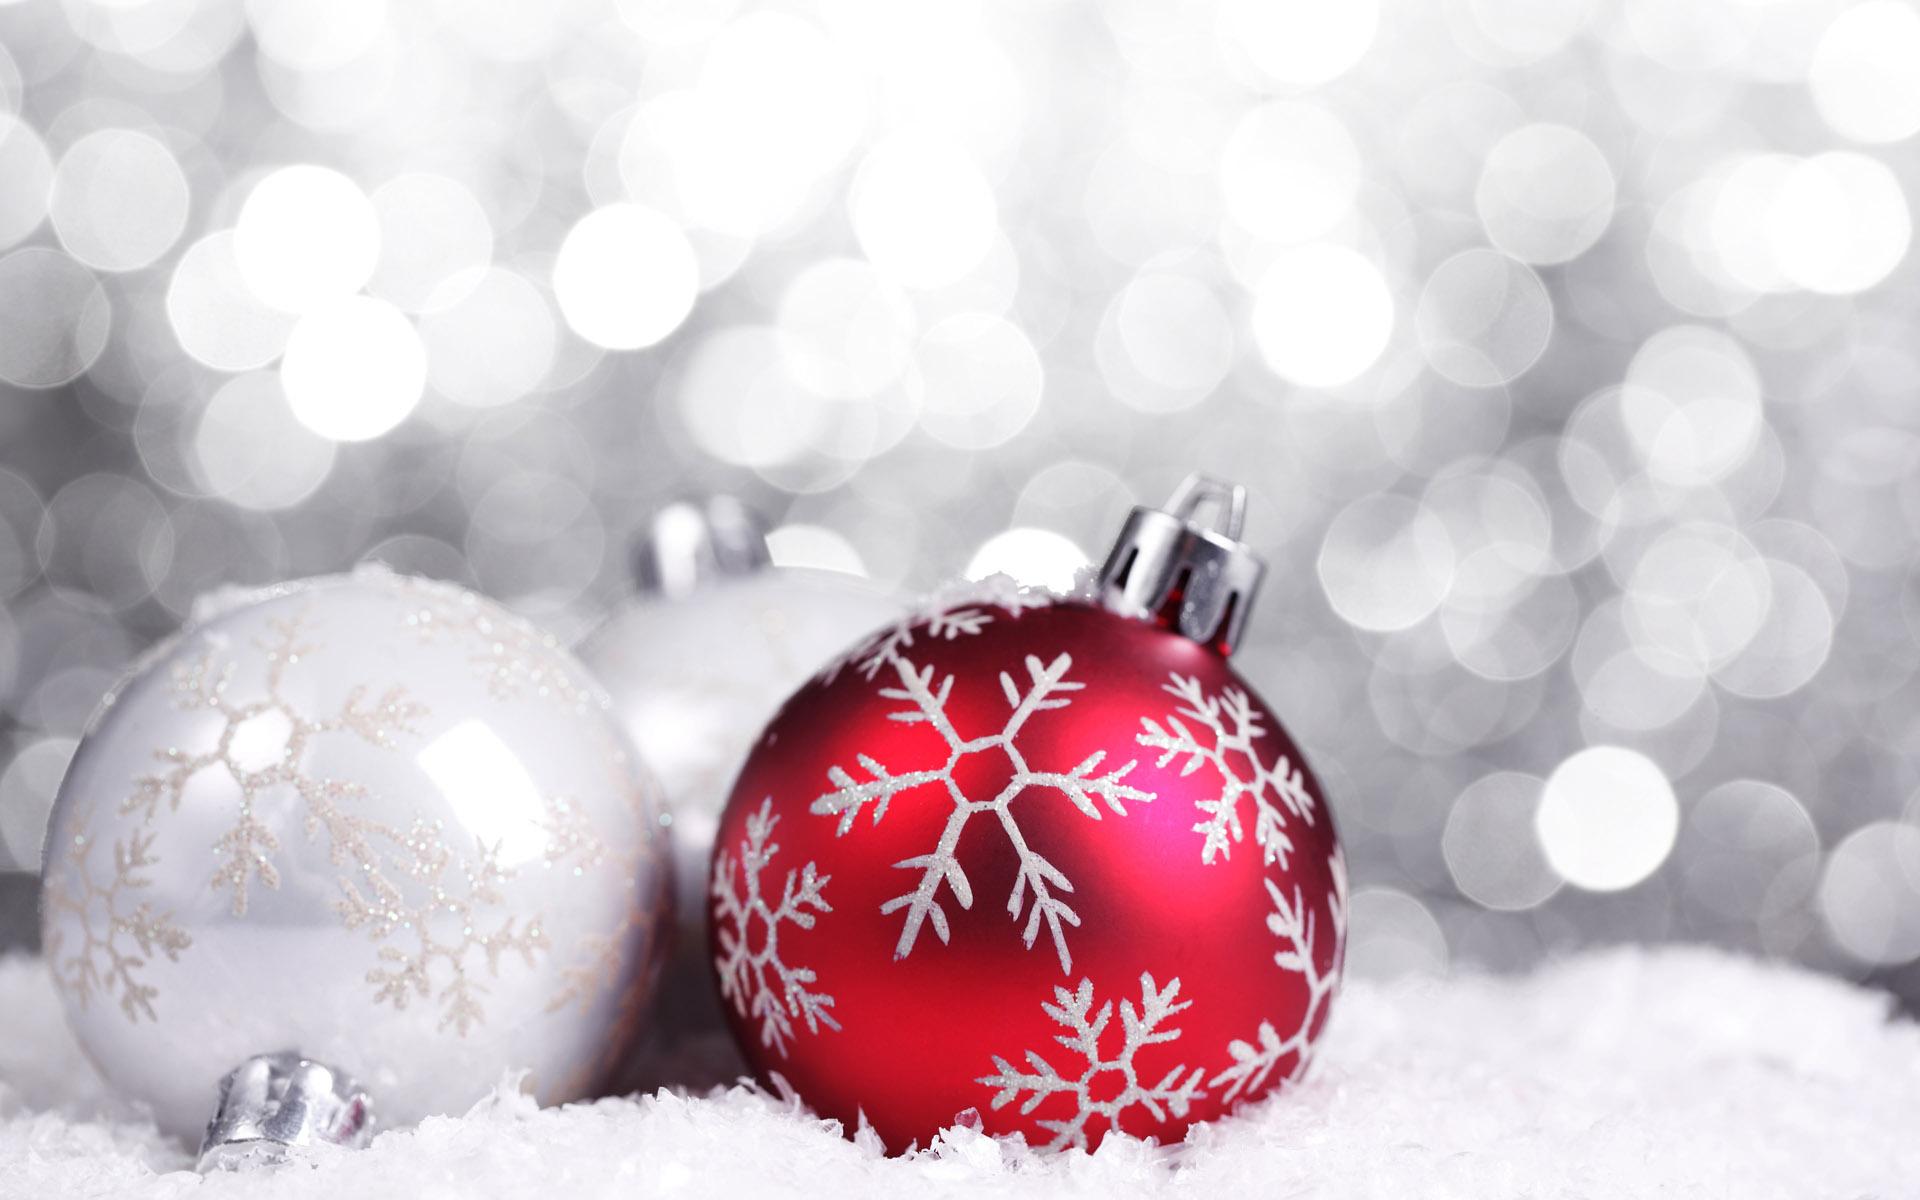 PackageLog Saves Christmas: Episode 4 (Winter is Coming) » Logware